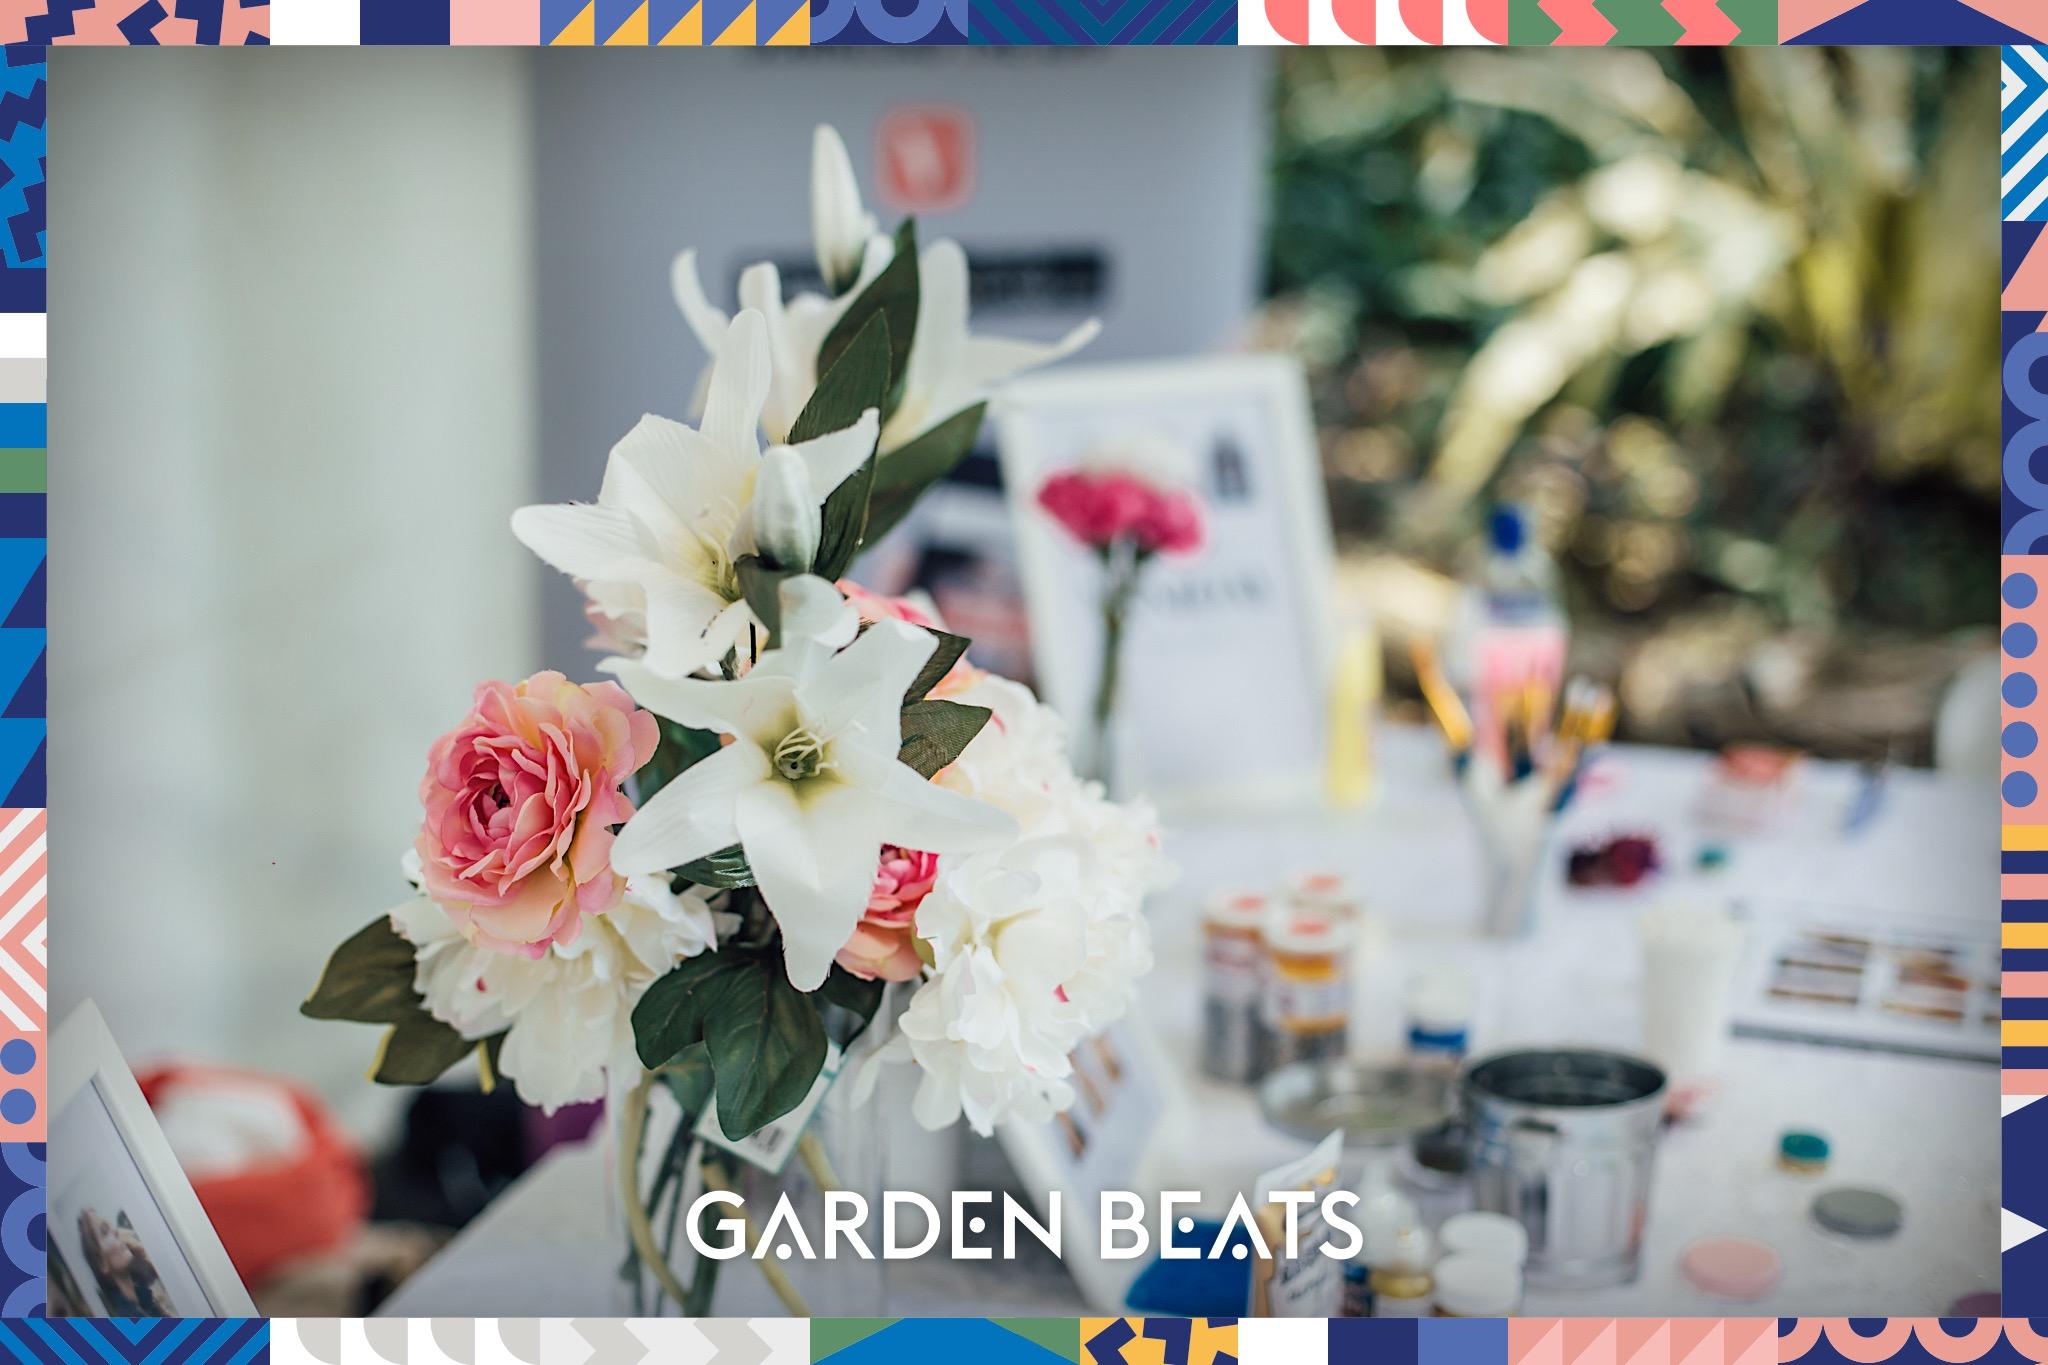 18032017_GardenBeats_Colossal108_WatermarkedGB.jpg